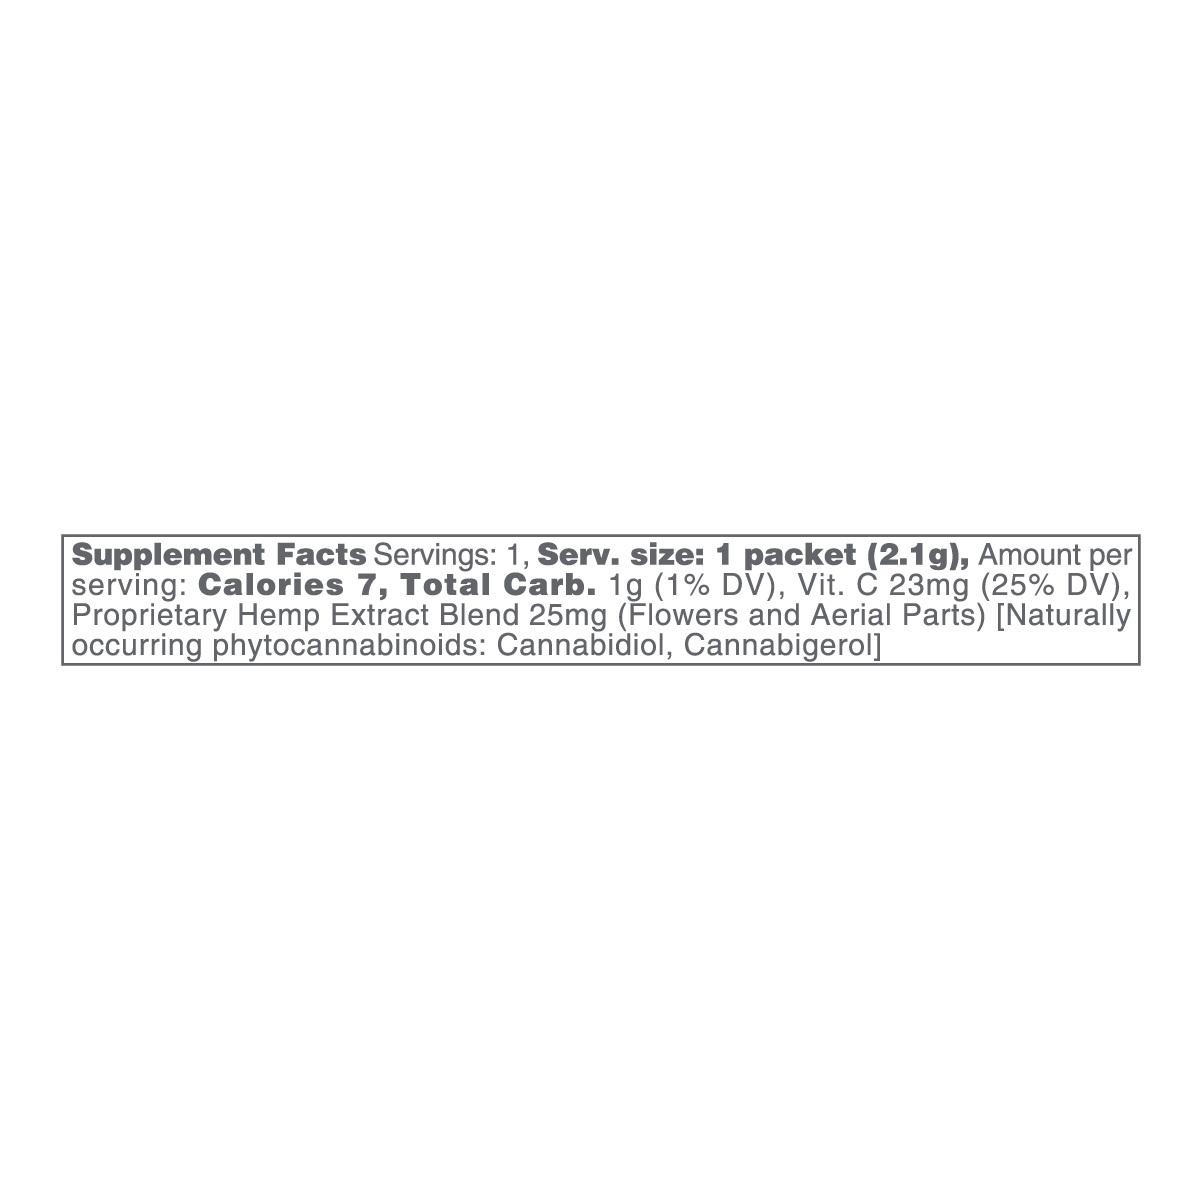 cbdMD, CBD Powdered Drink Mix, Broad Spectrum THC-Free, Kiwi Strawberry, 10ct, 250mg CBD 2